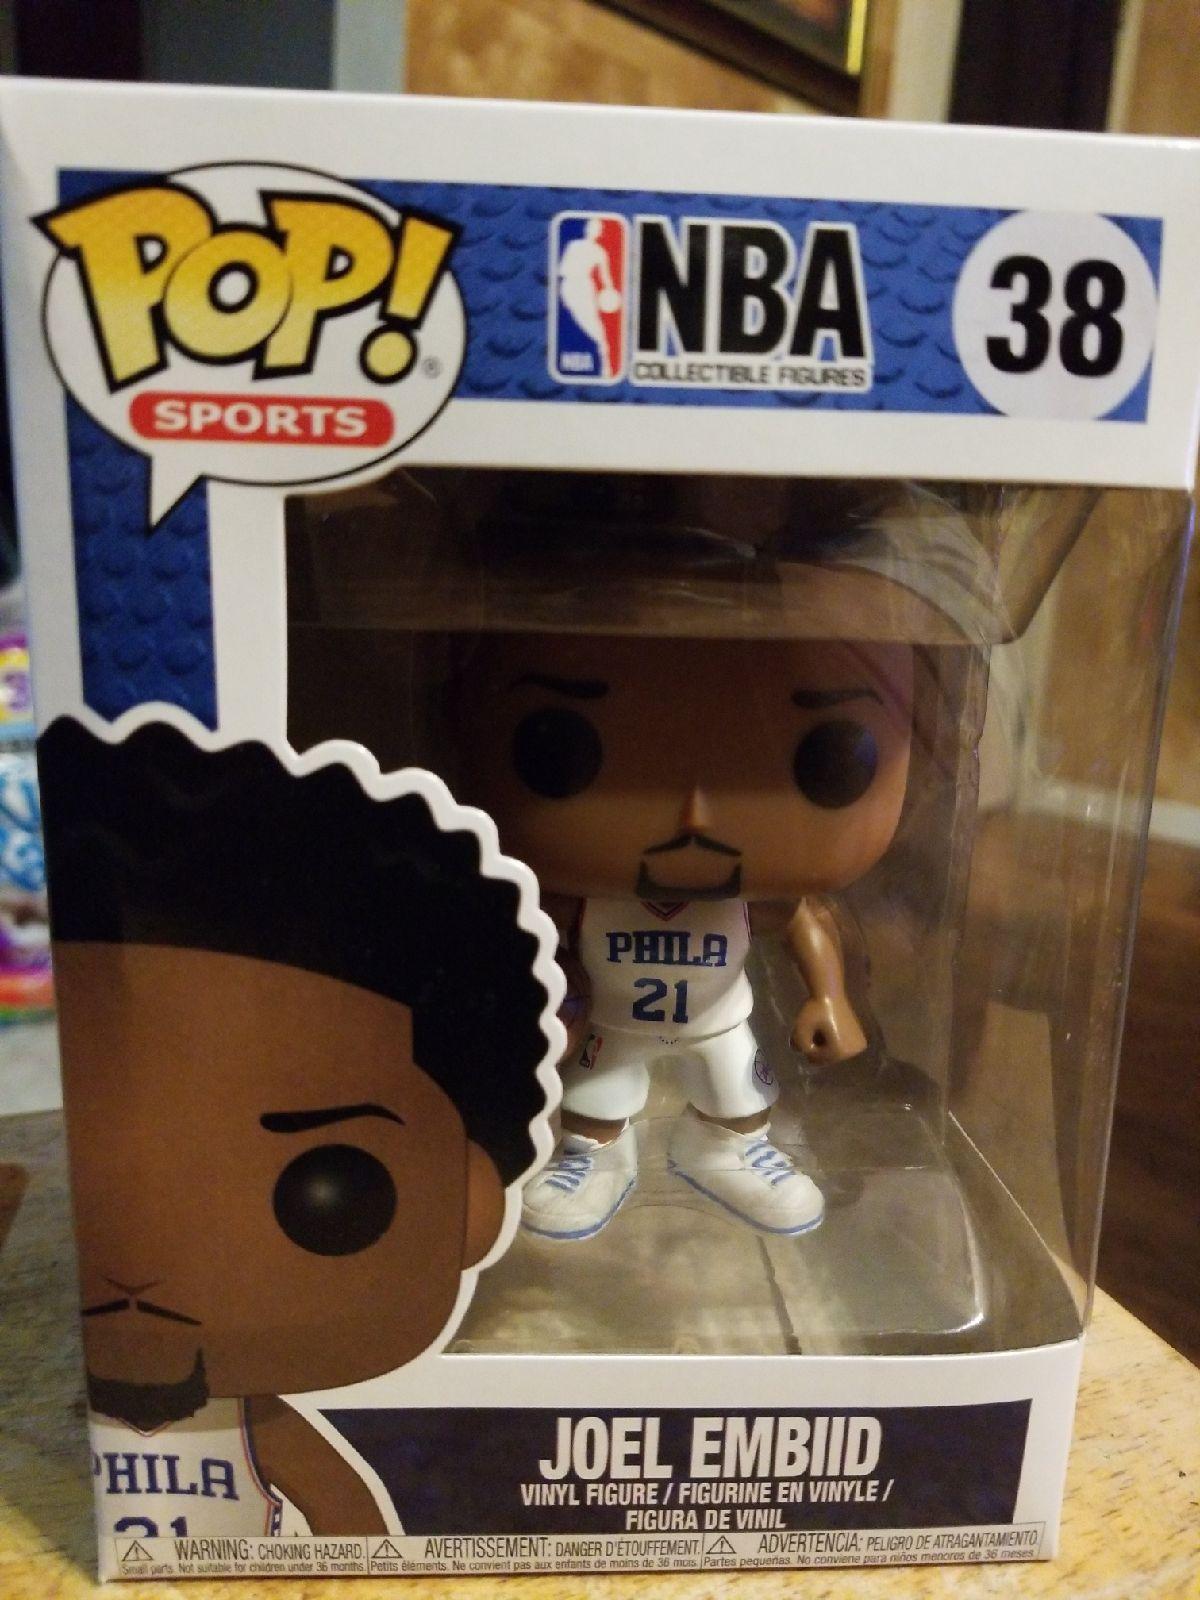 NBA 38 Joel Embiid Funko Pop! Sports. Pop! Vinyl's